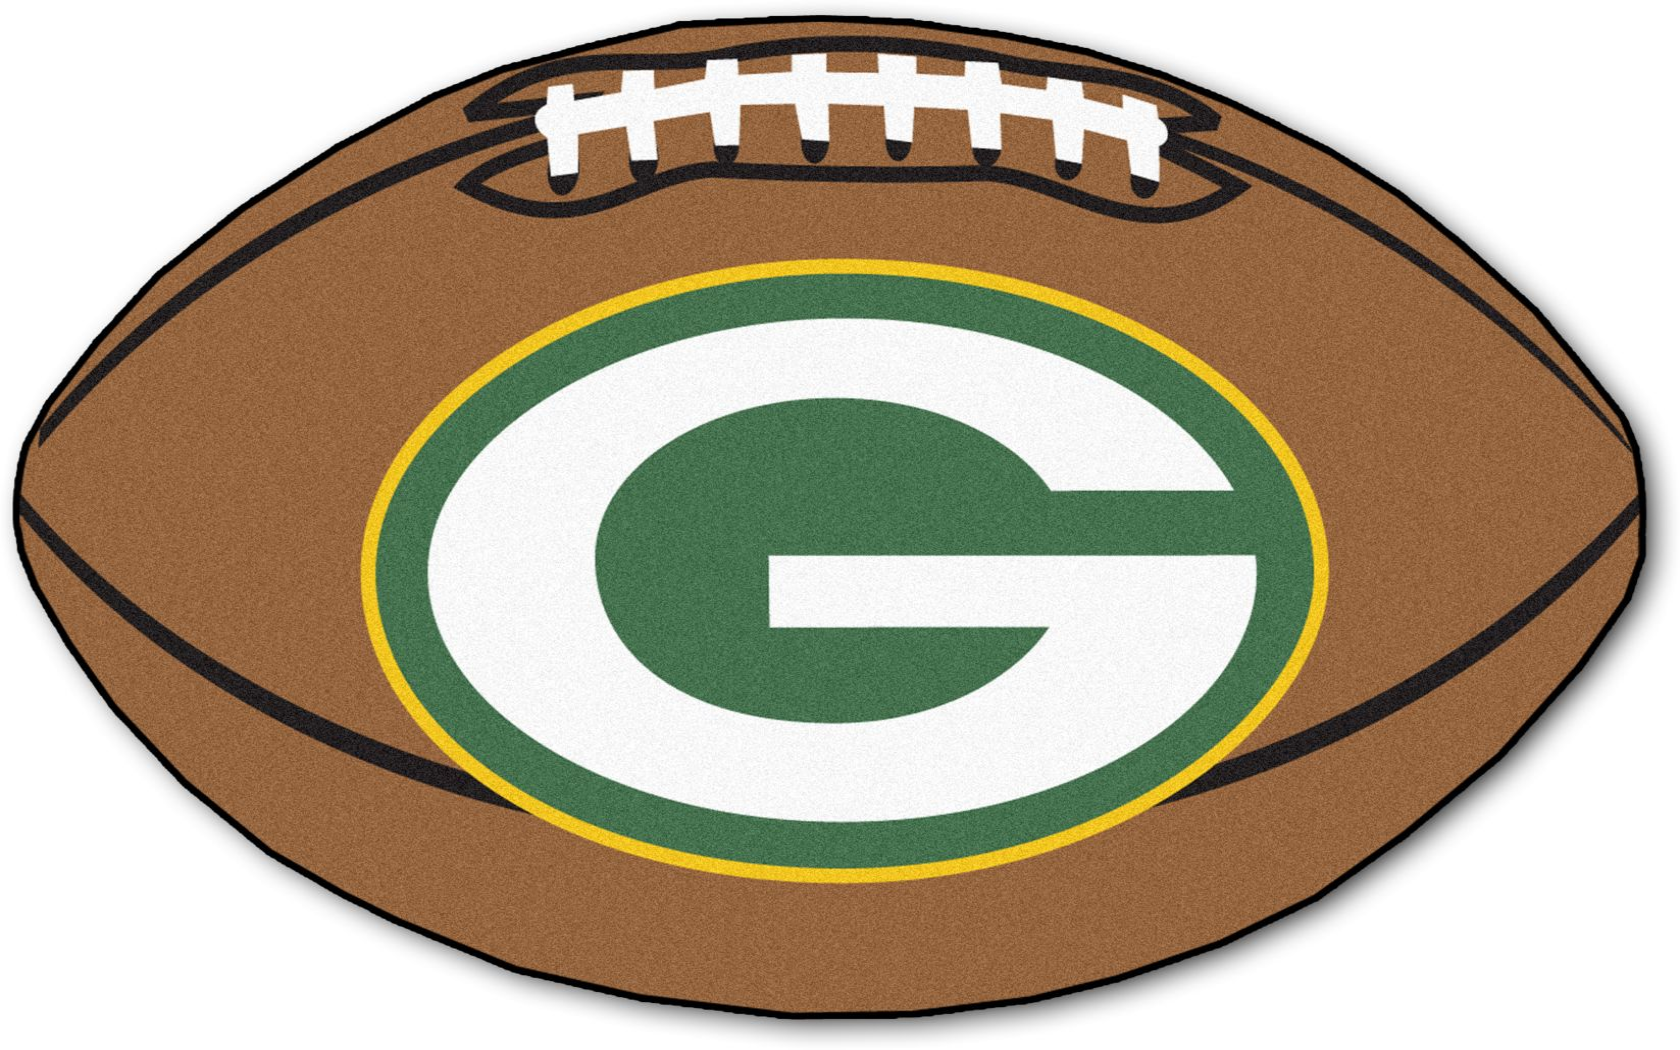 "NFL Football Mascot Green Bay Packers 1'6""x 1'10"" Rug"